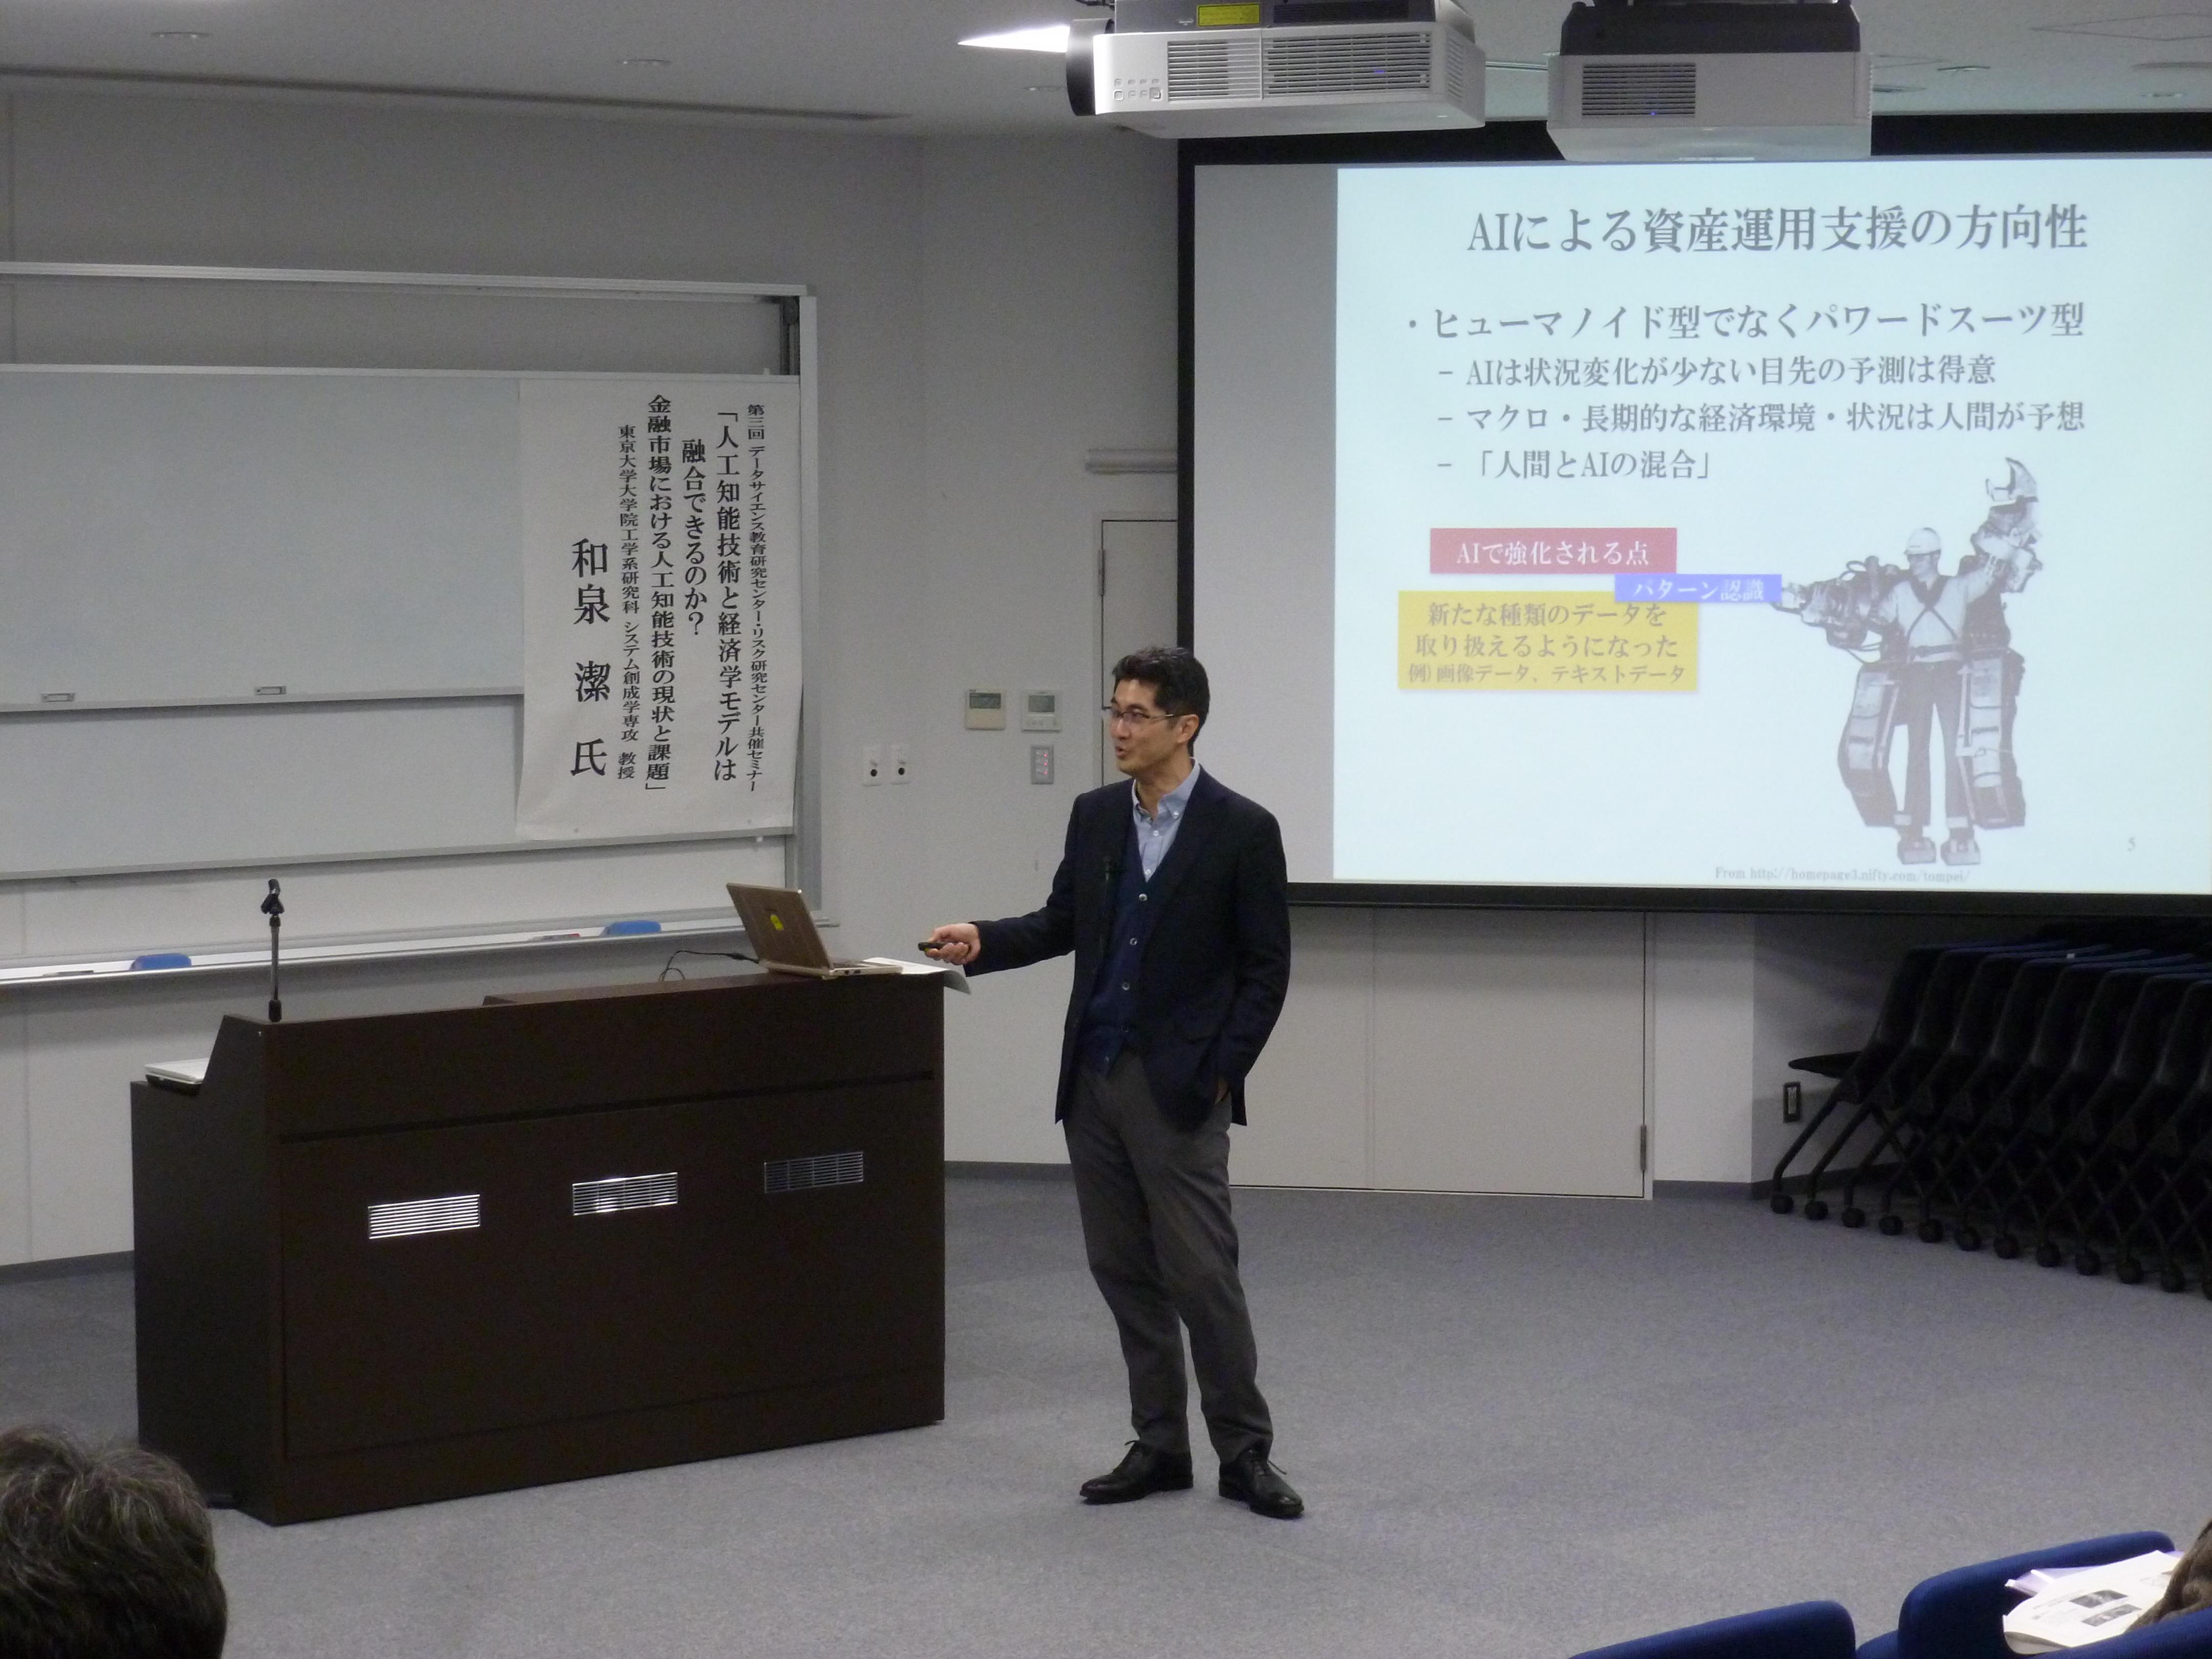 https://www.econ.shiga-u.ac.jp/risk/P1040612.JPG